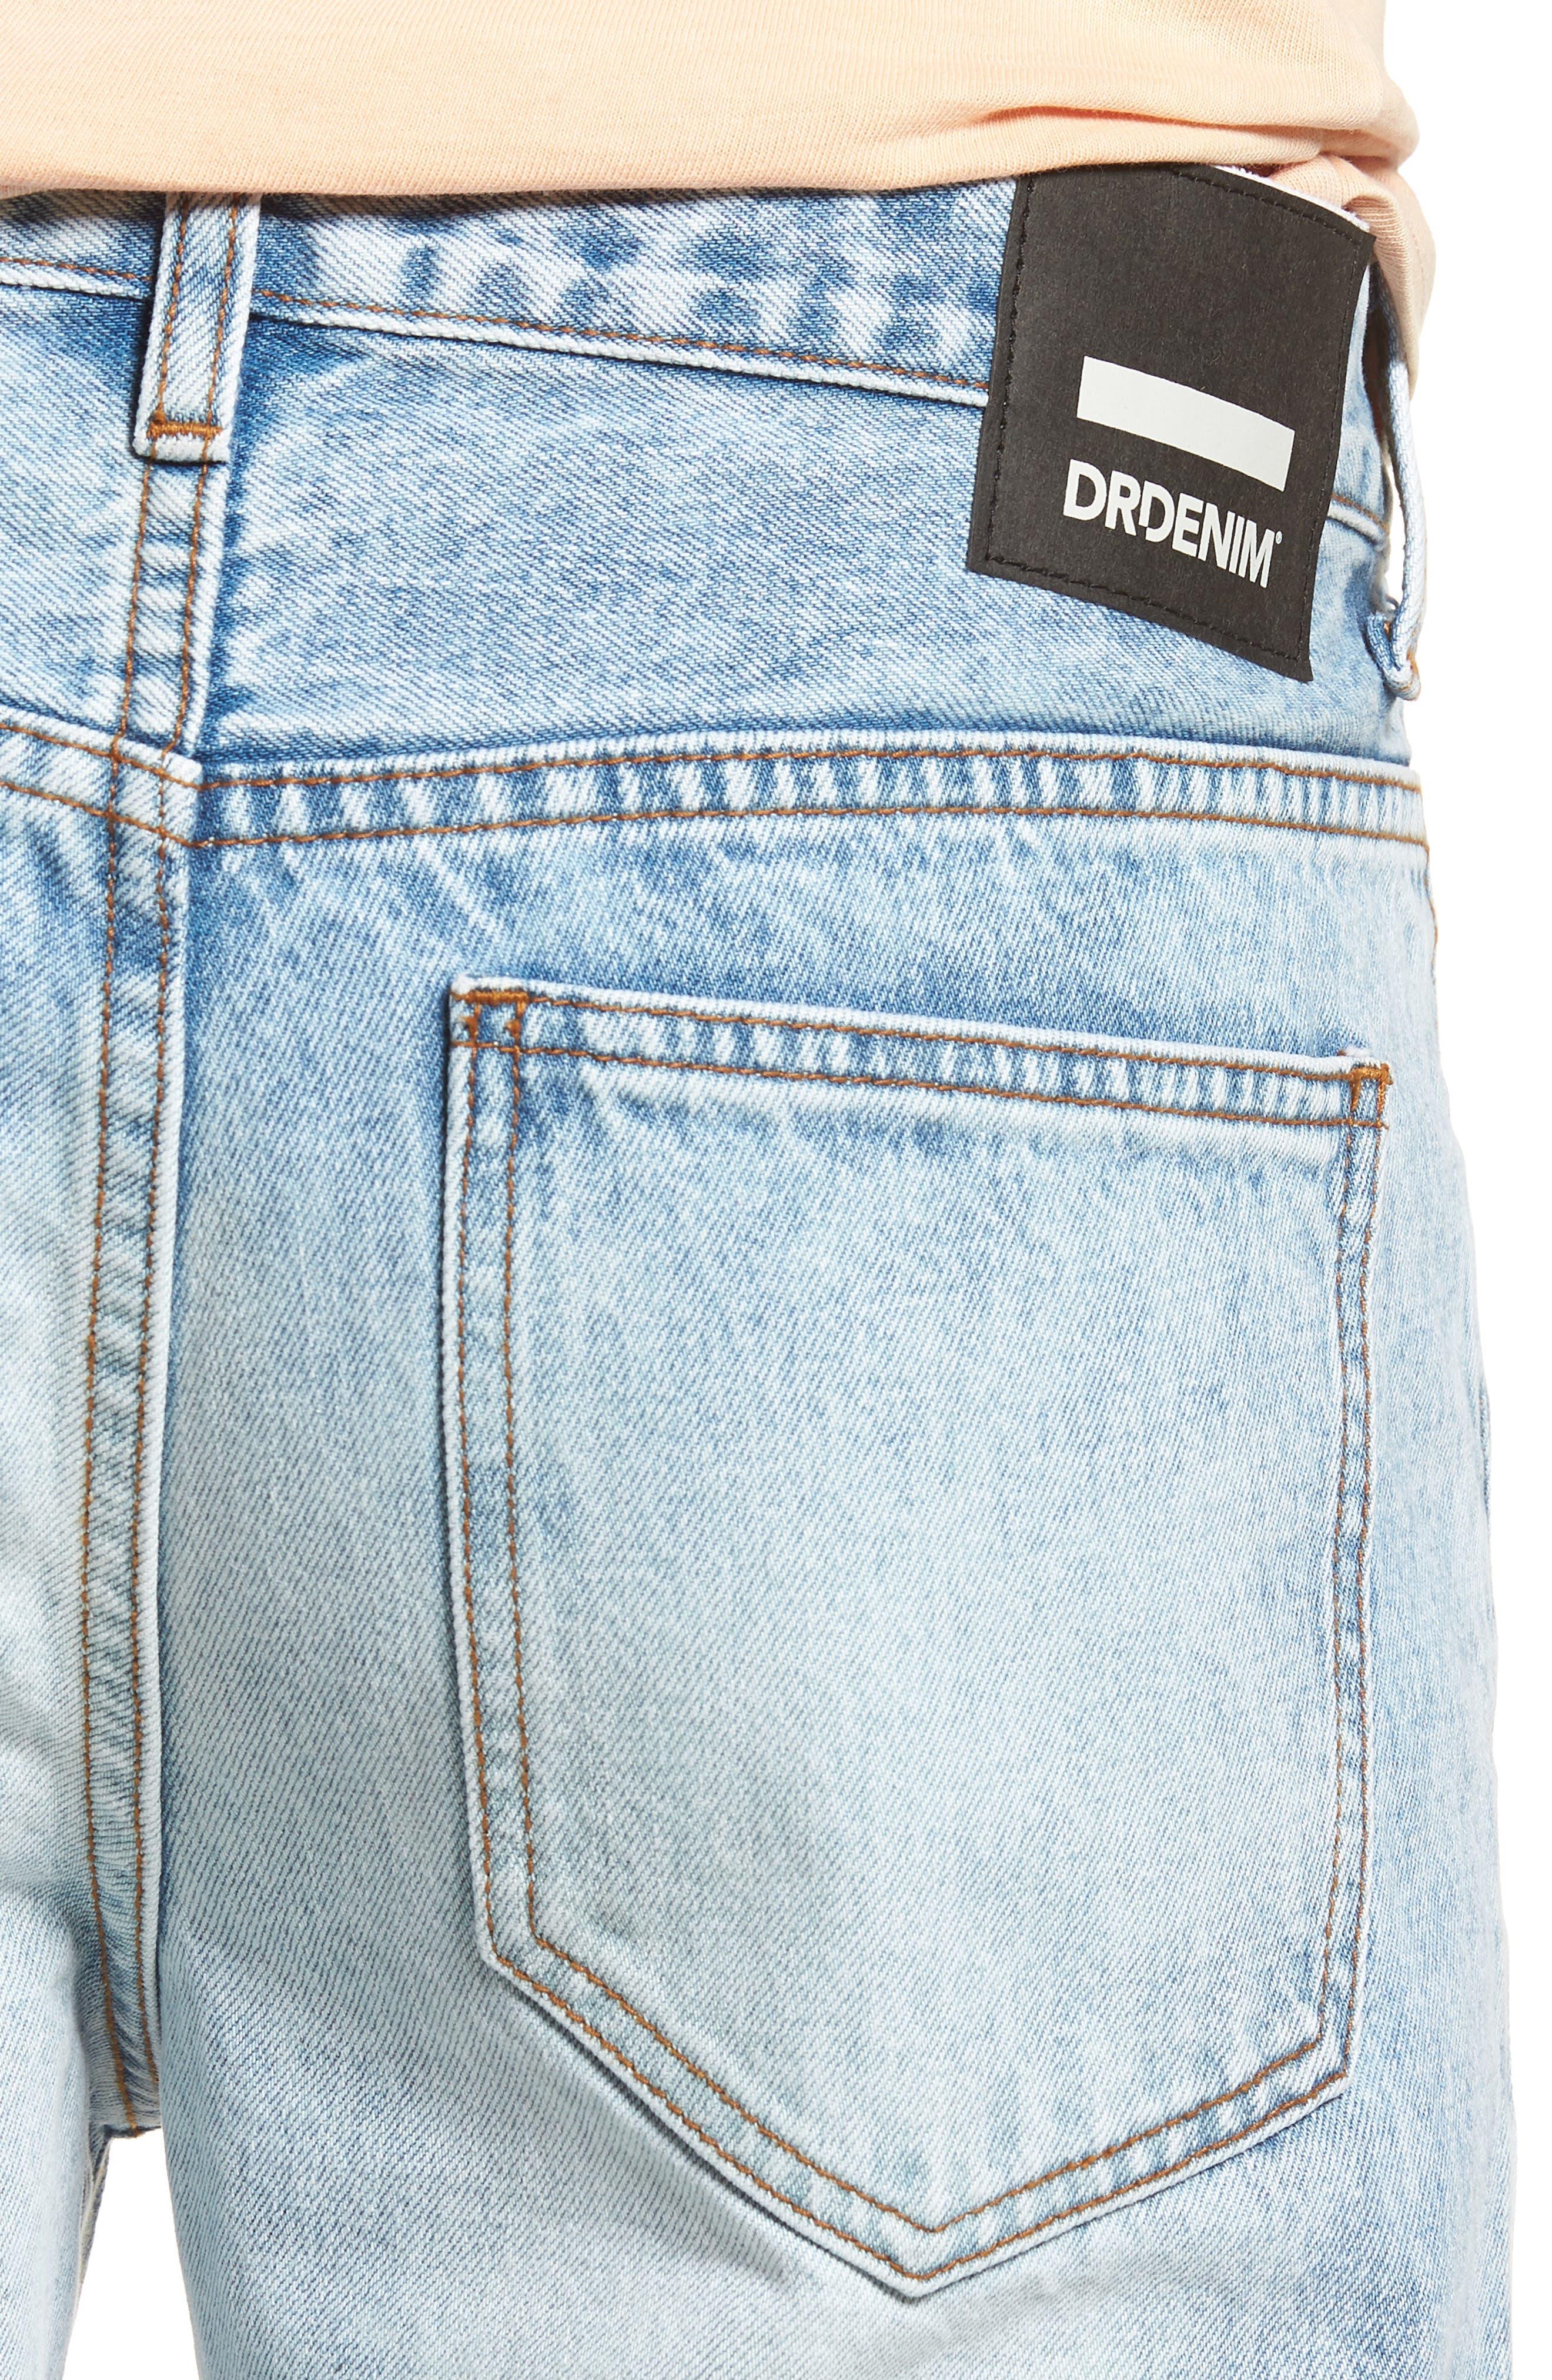 Otis Straight Leg Jeans,                             Alternate thumbnail 4, color,                             Light Blue Wash